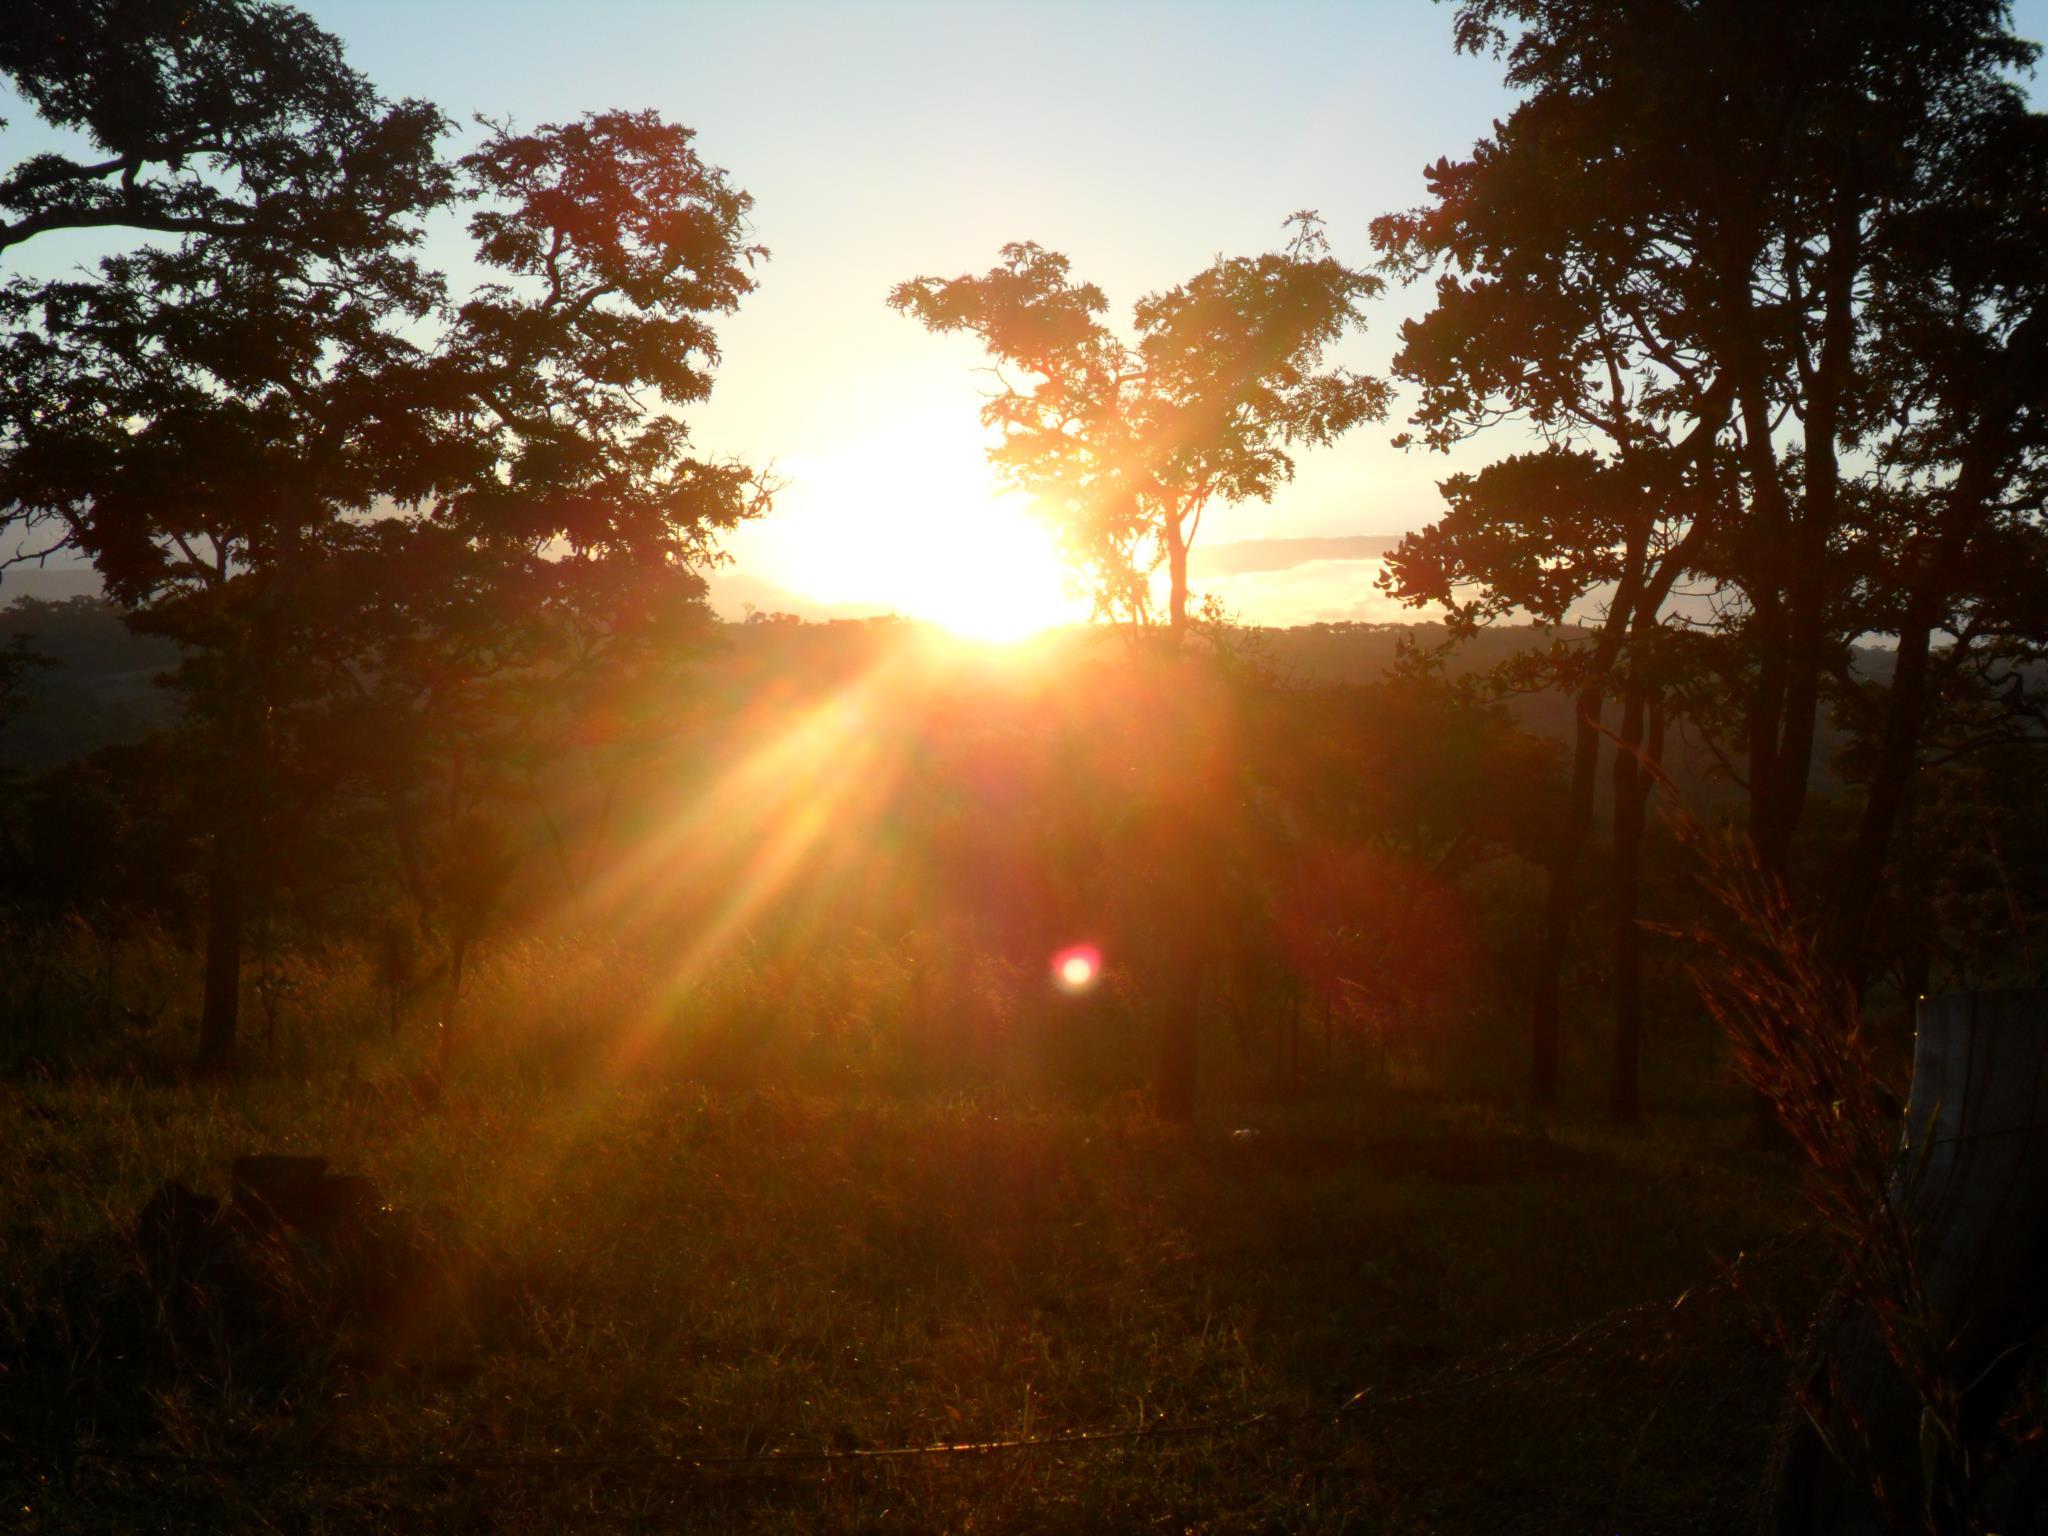 Sun through trees at Chandame